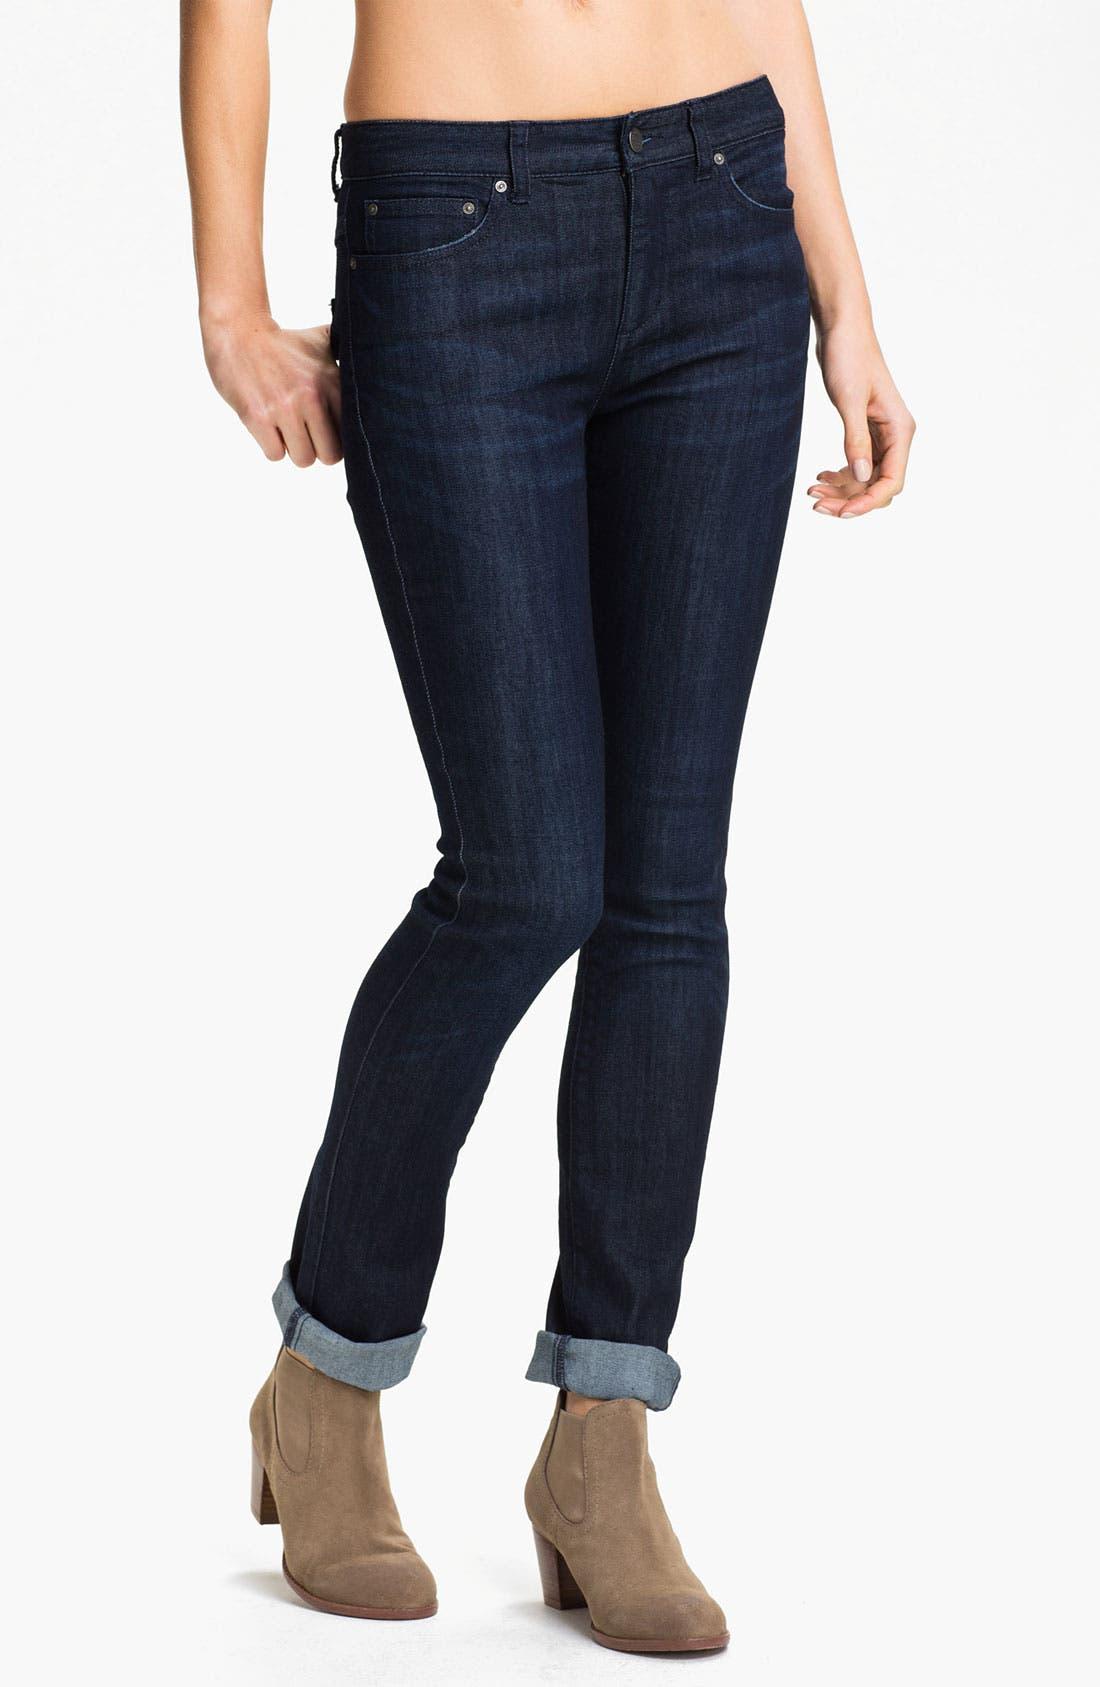 Alternate Image 1 Selected - Free People Stretch Denim Skinny Jeans (Dark Eagle Blue Wash)